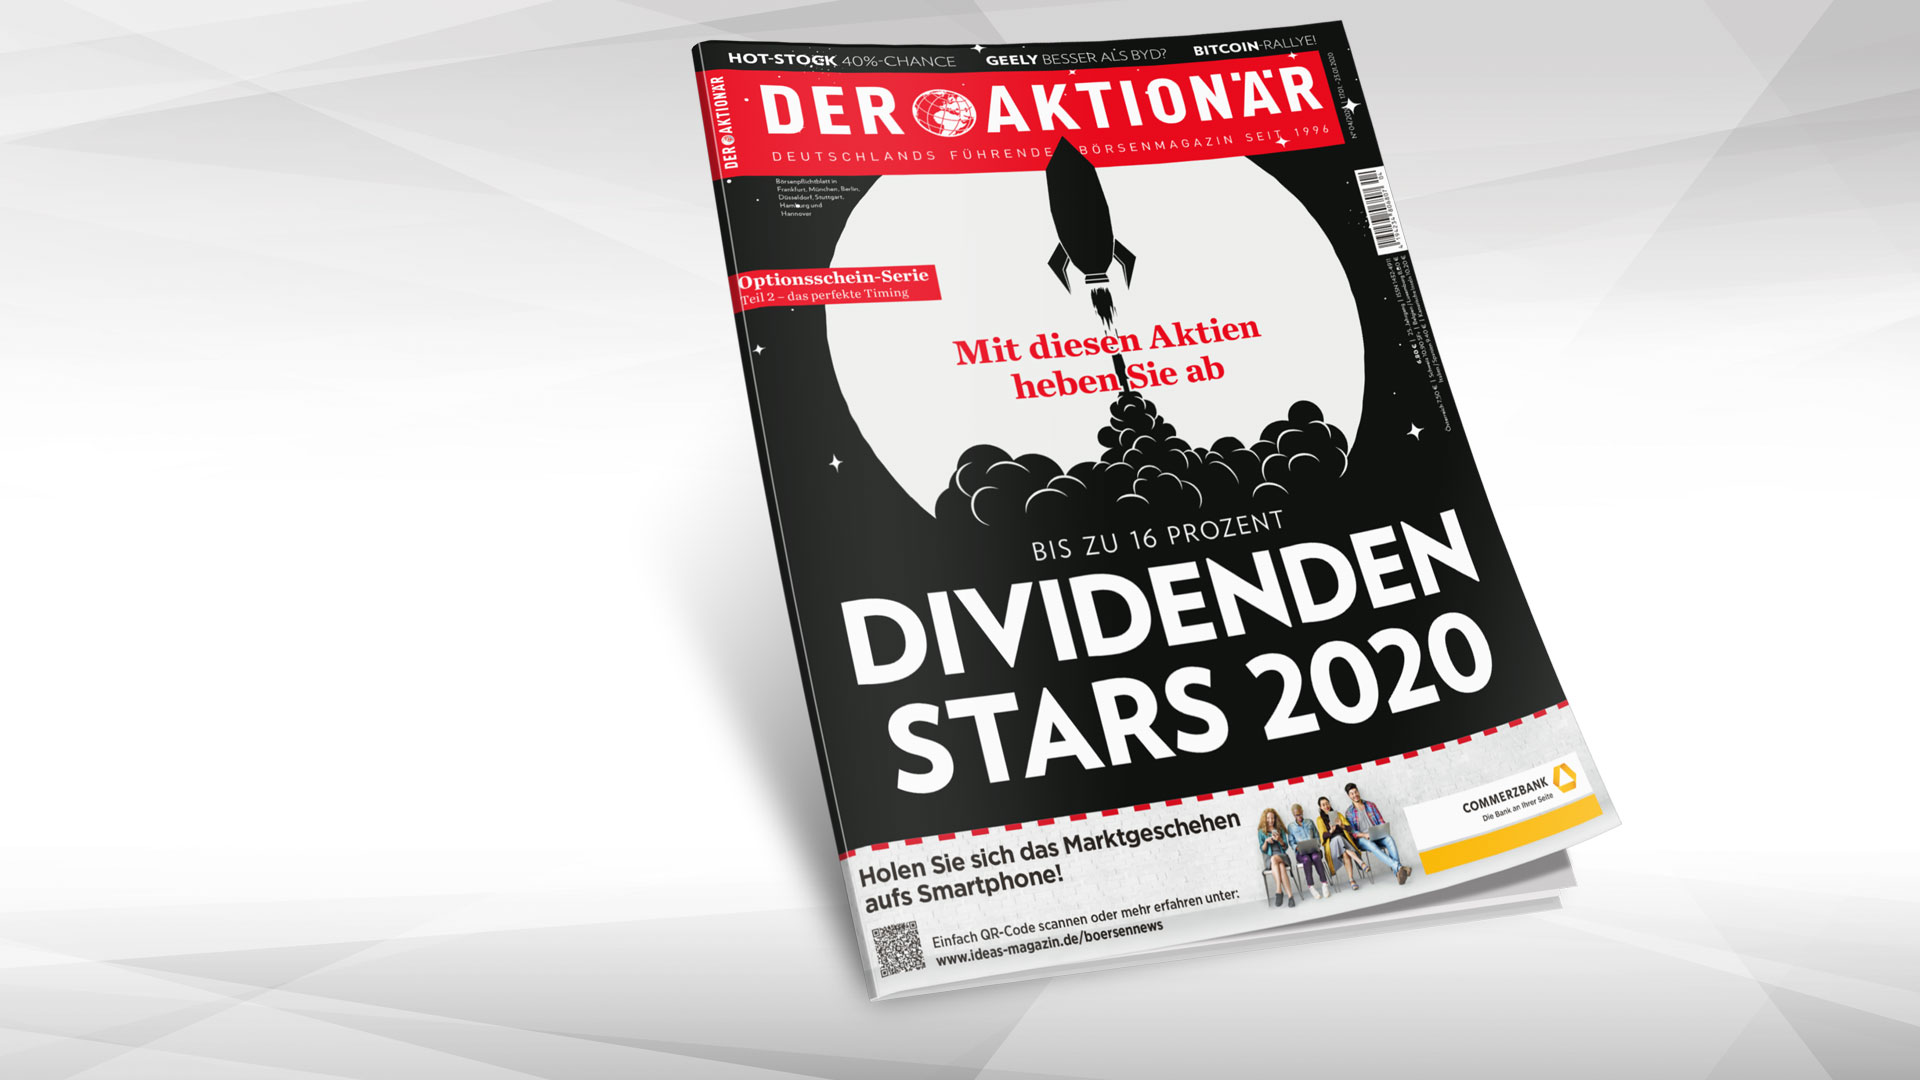 Dividenden Stars